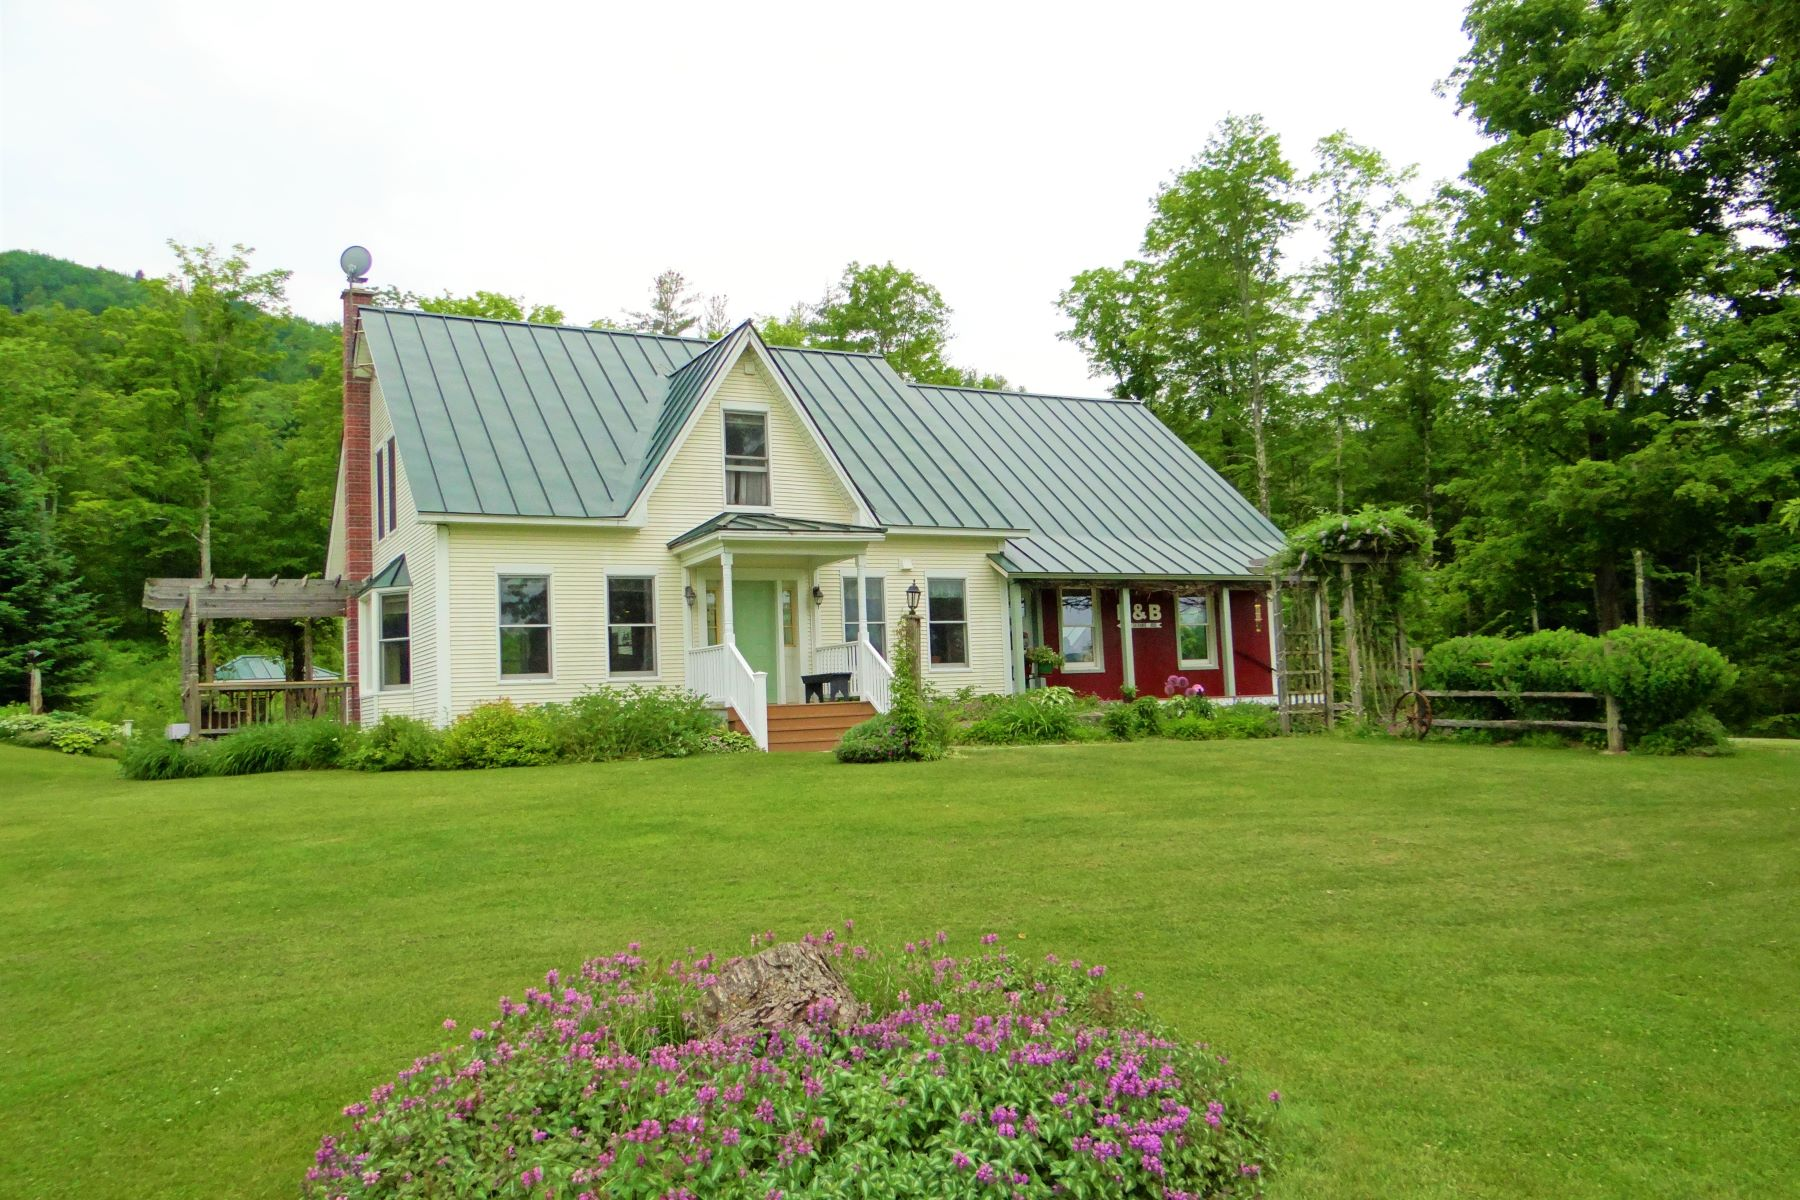 Single Family Home for Sale at 1217 Back River Road, Royalton 1217 Back River Rd Royalton, Vermont 05068 United States